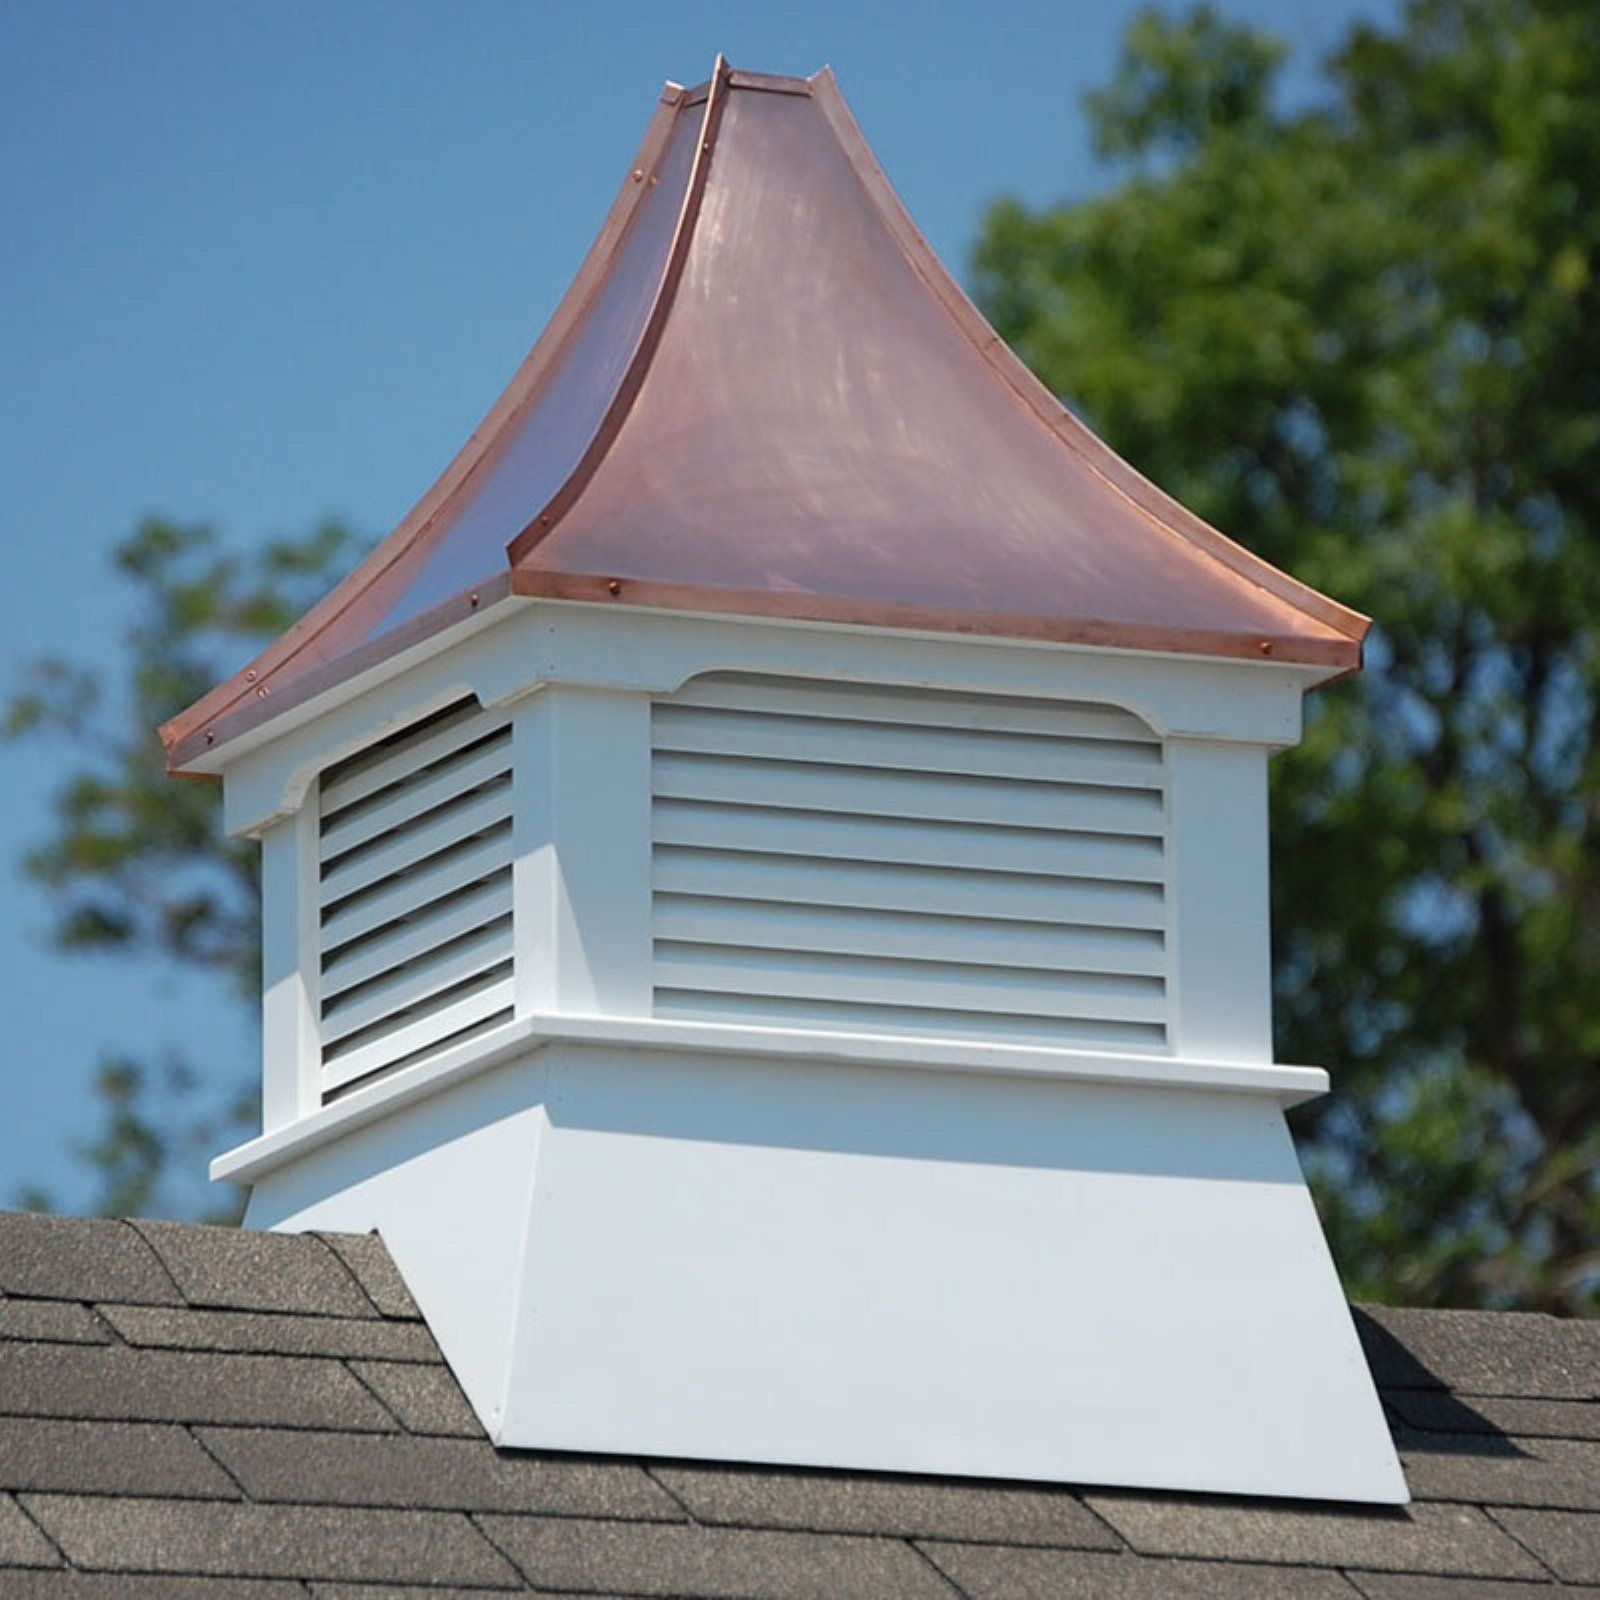 Accentua Olympia Cupola Copper roof, Cupolas, Roof colors